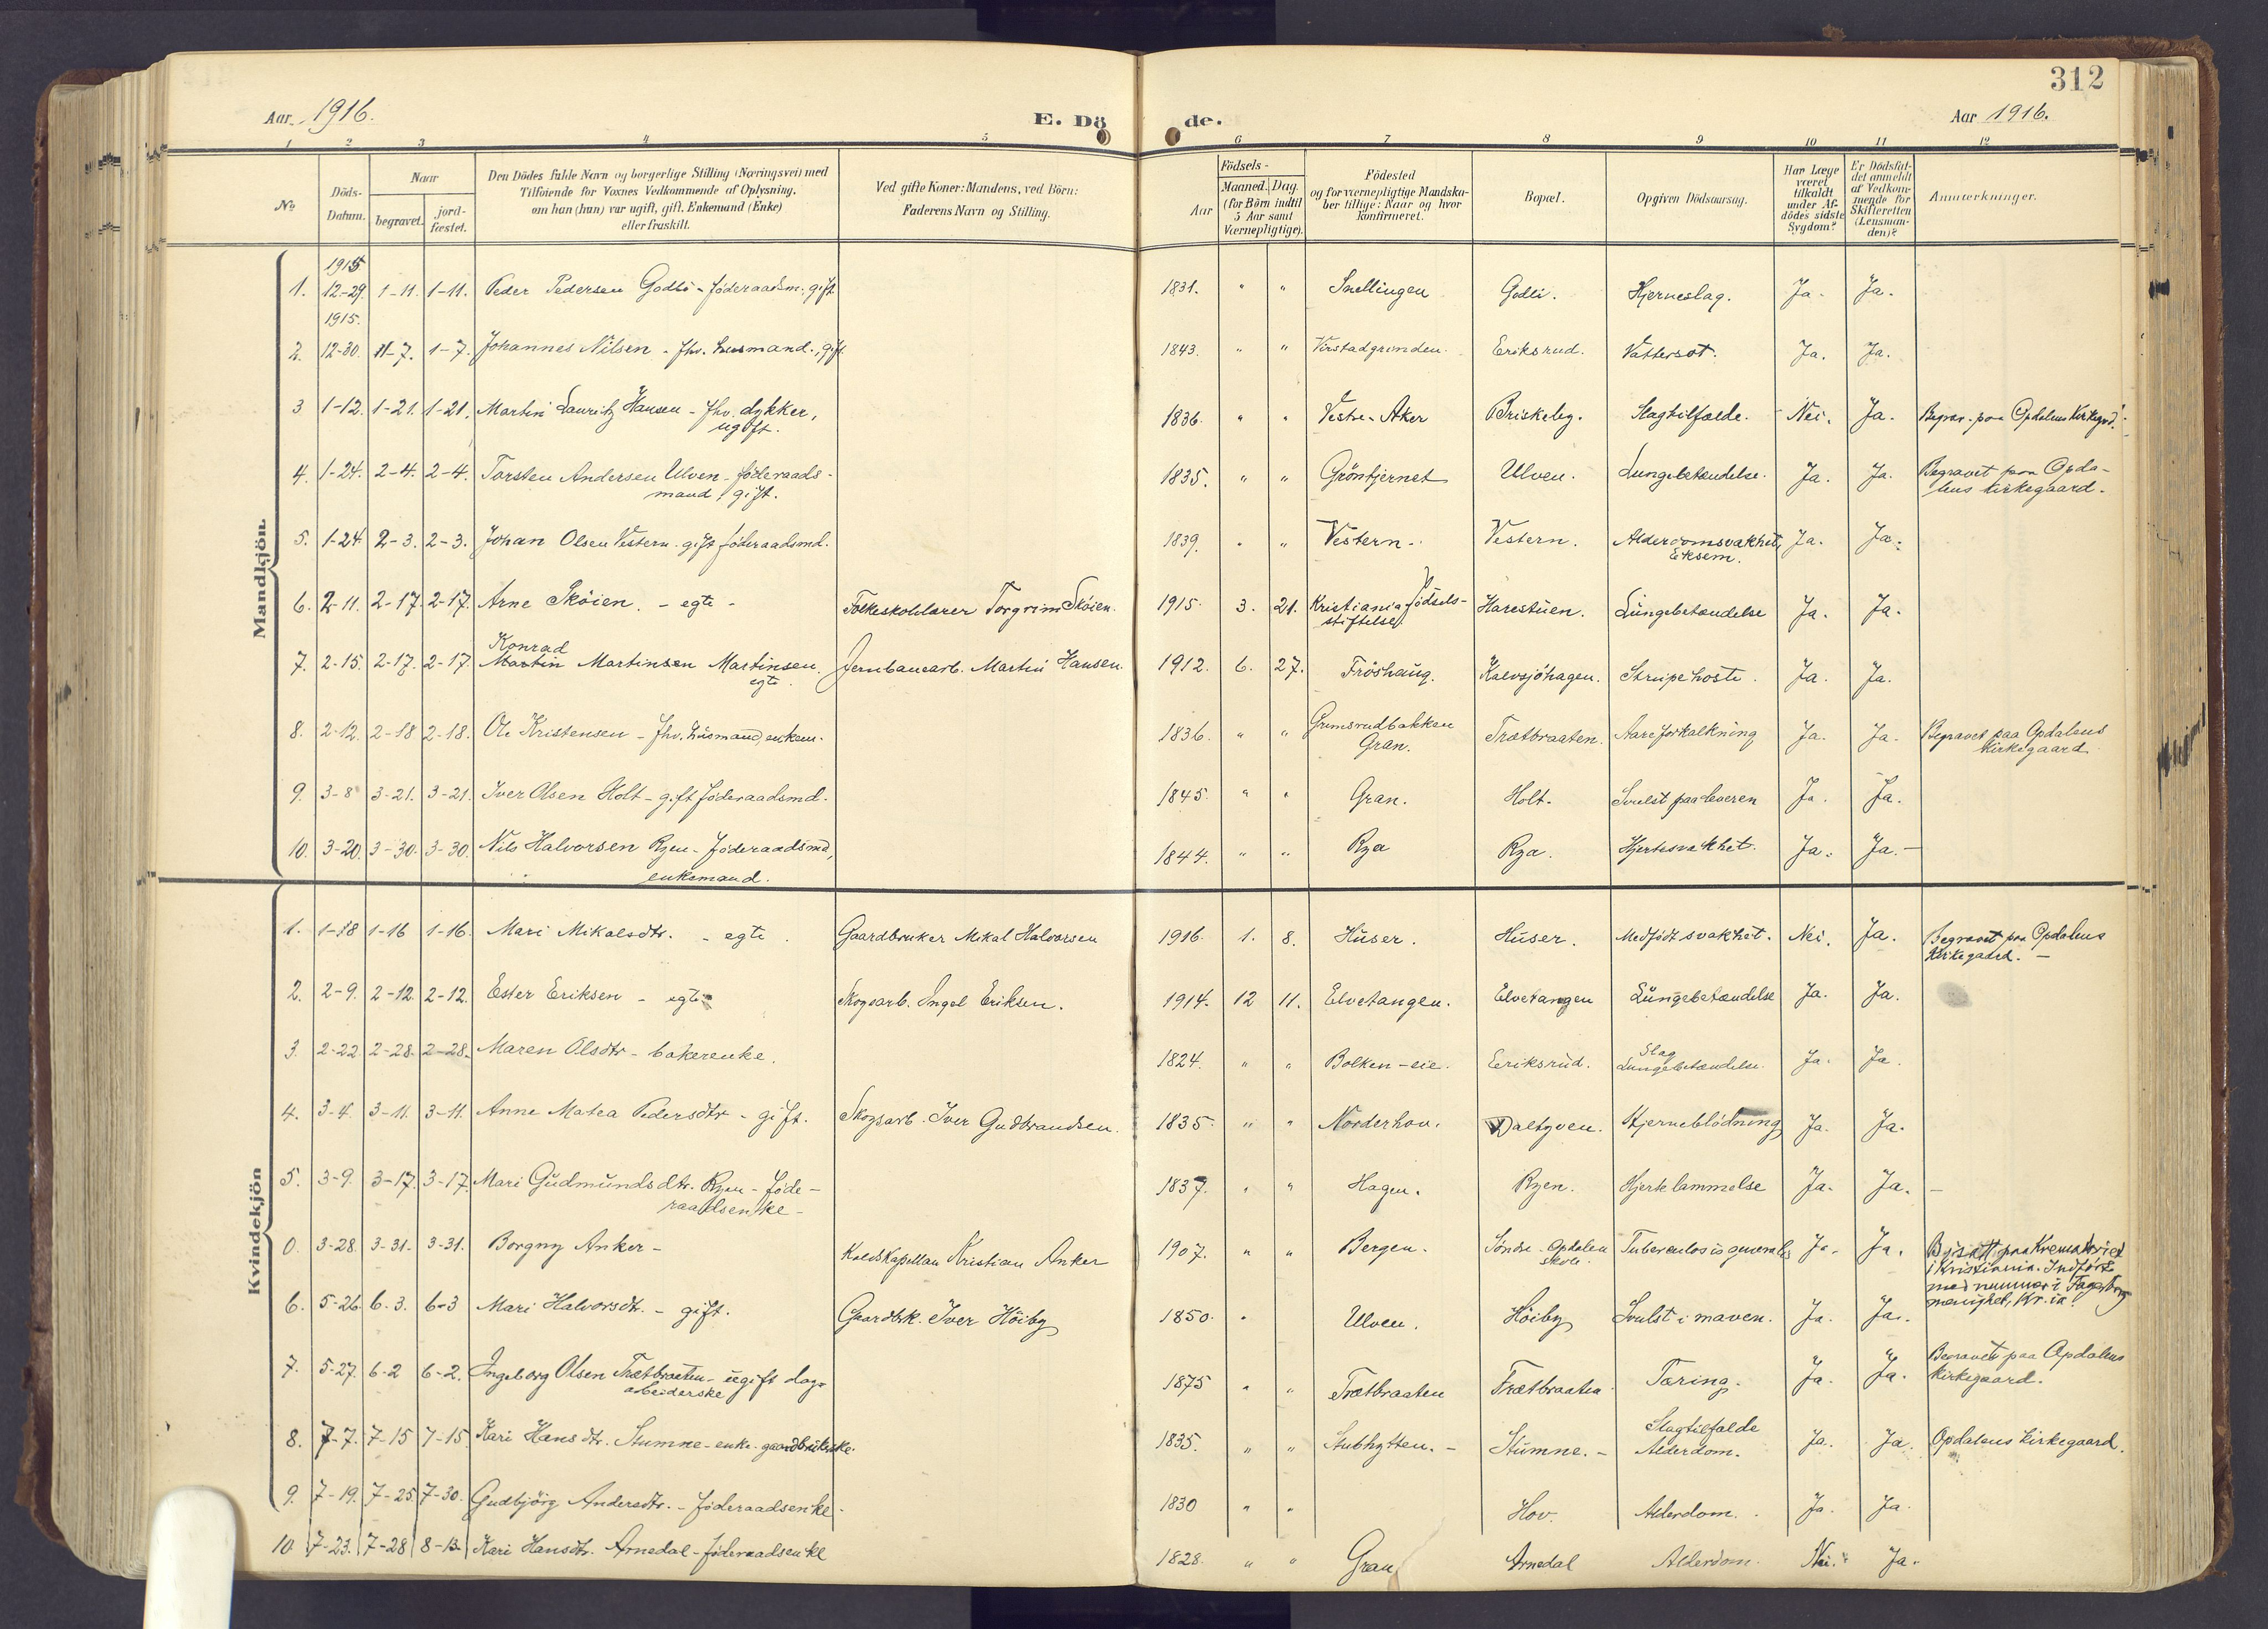 SAH, Lunner prestekontor, H/Ha/Haa/L0001: Ministerialbok nr. 1, 1907-1922, s. 312